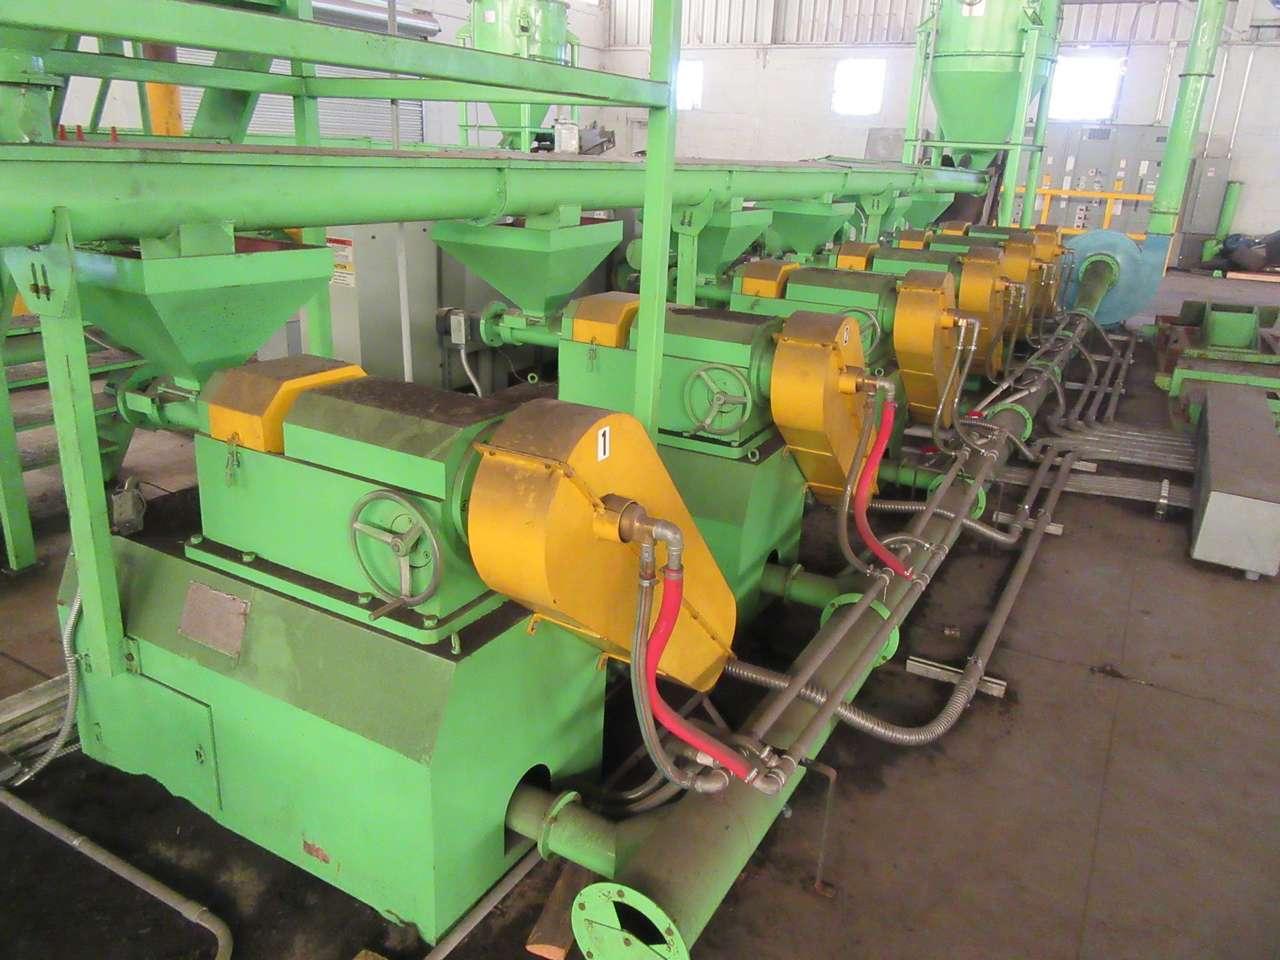 Lot 41 - 2014 Jiangyin Jinall International Trade Co. 185 Wind Conveyor